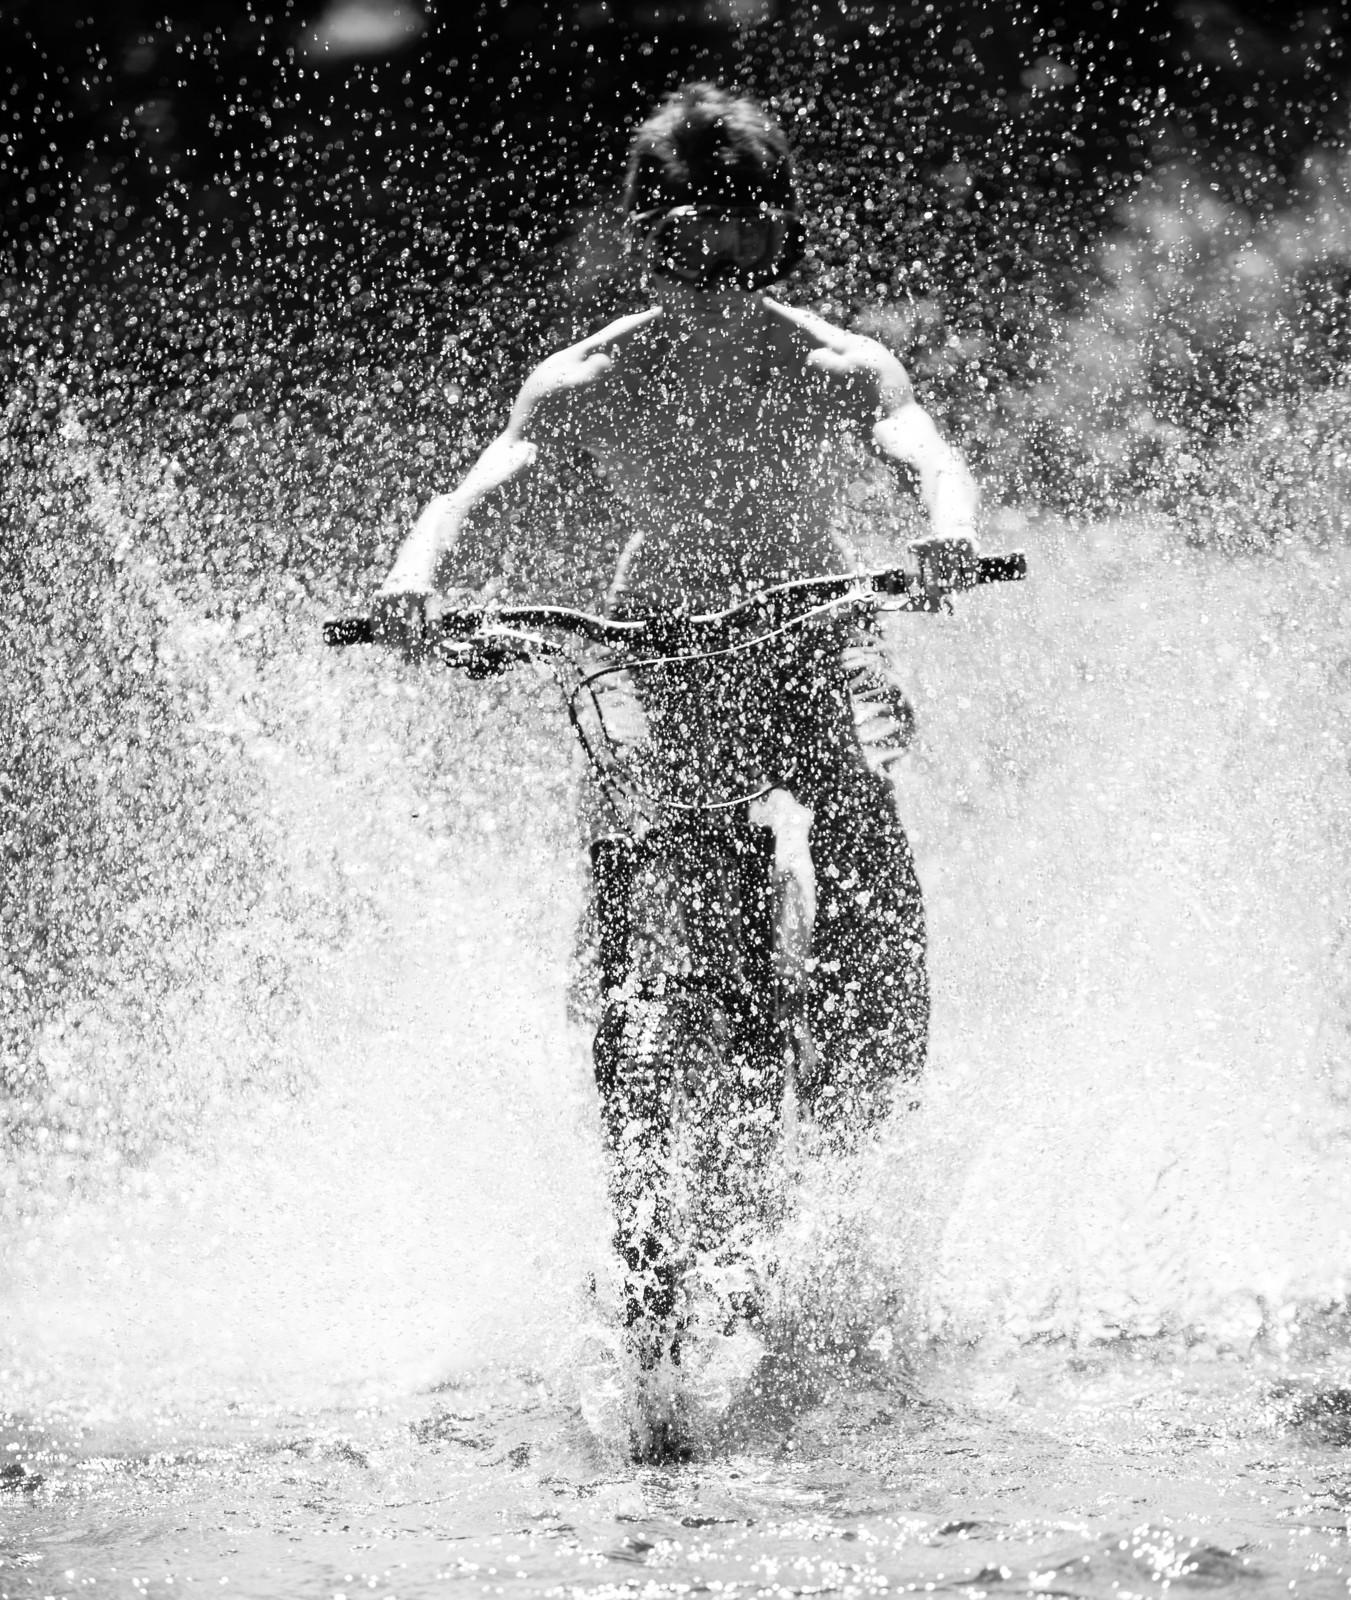 qra-4 - MouflonsRiders - Mountain Biking Pictures - Vital MTB